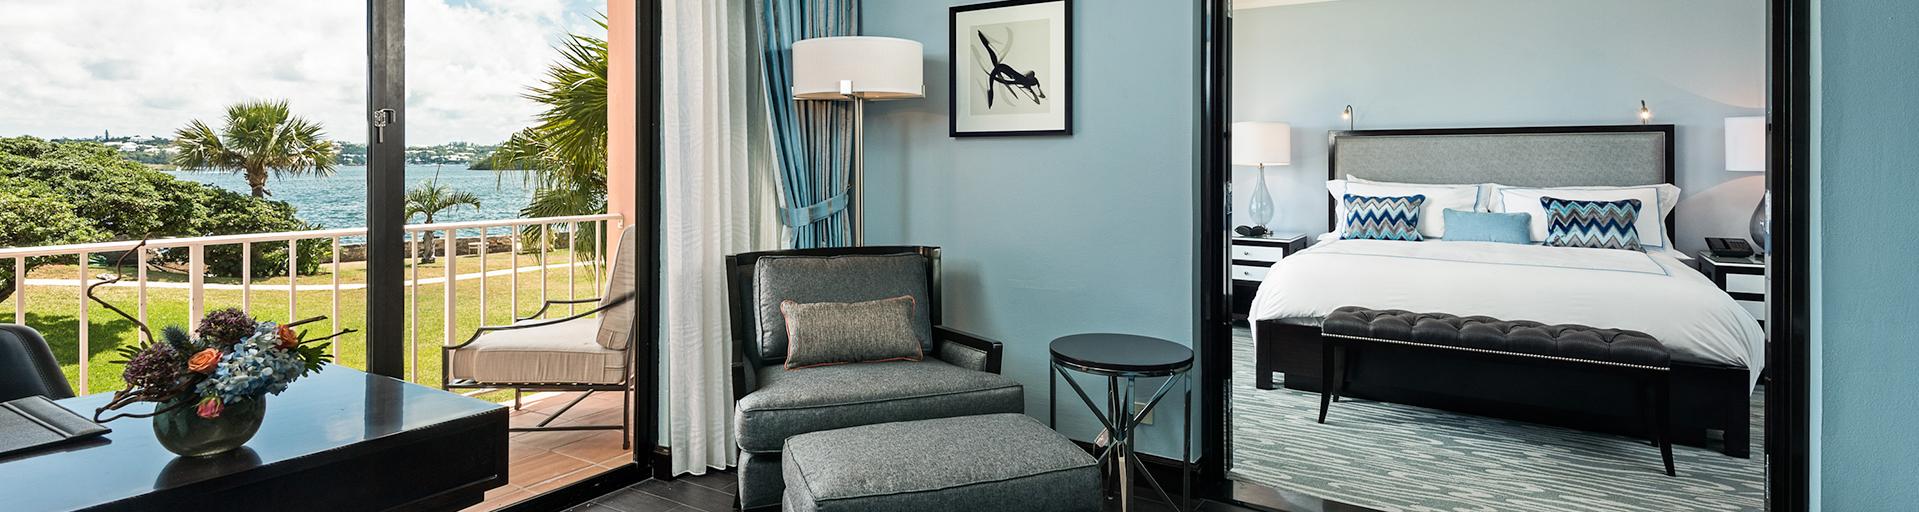 Luxury Hotel Hospitality Lighting